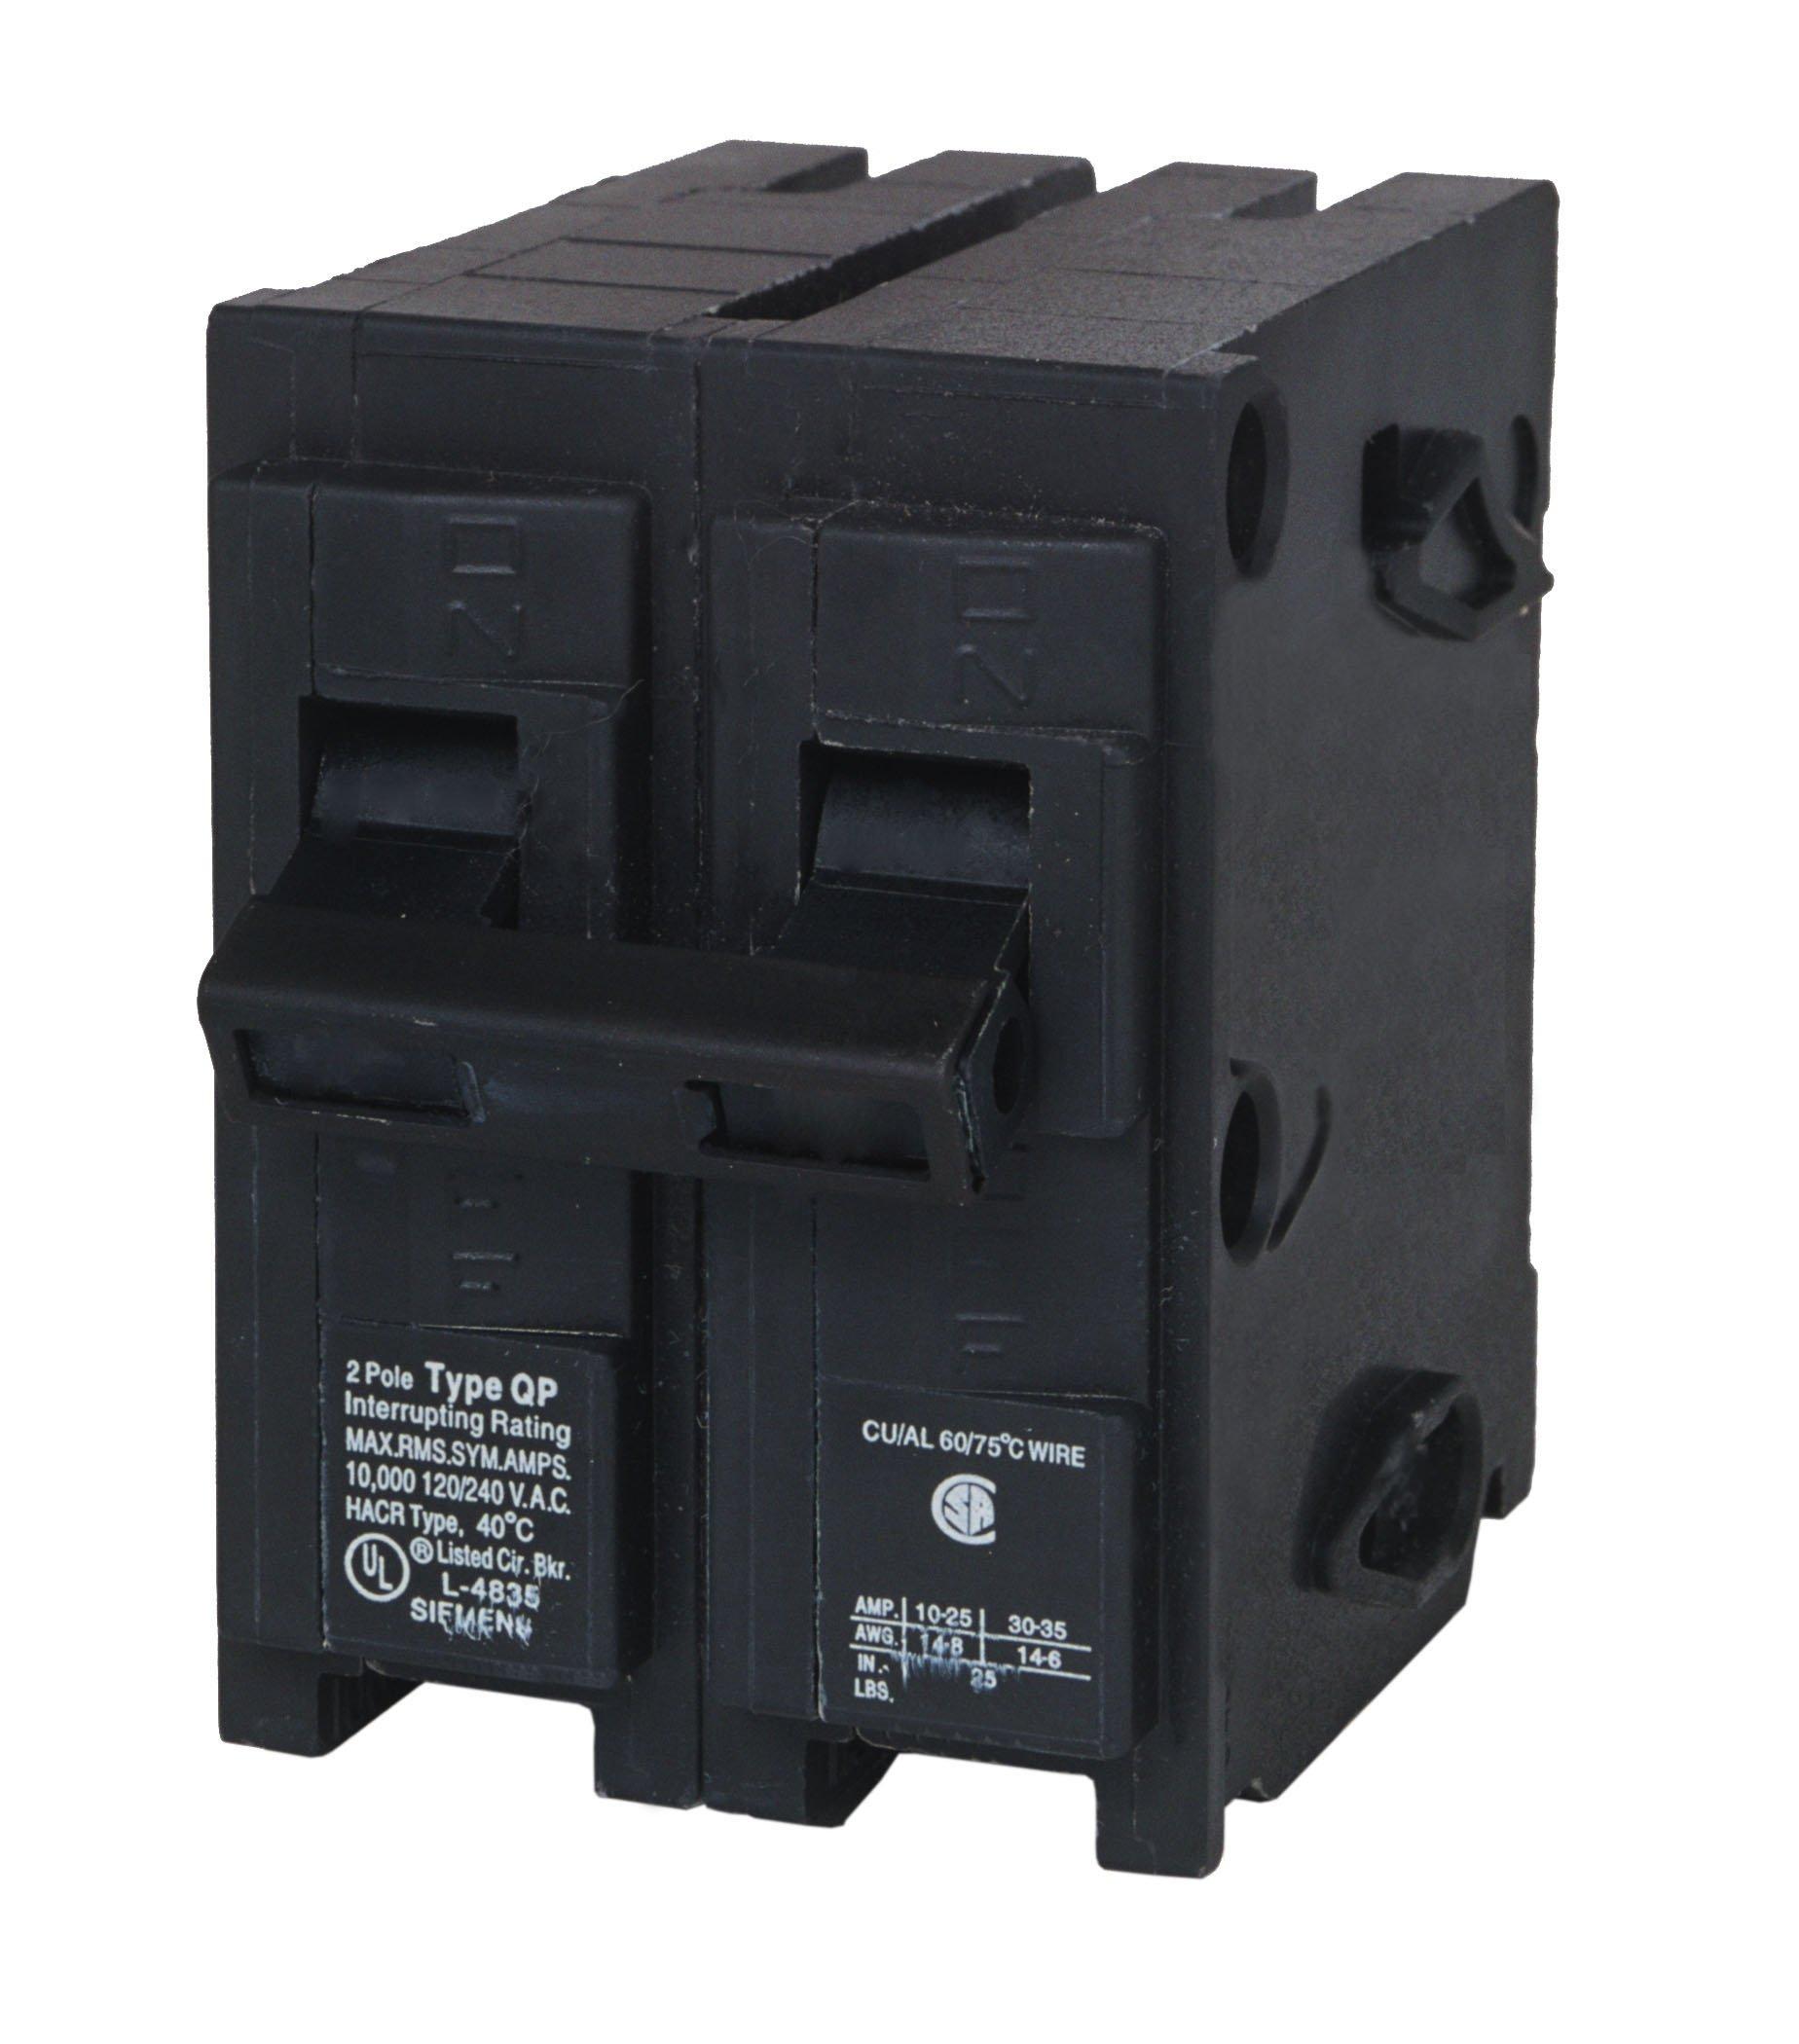 MP270 70-Amp Double Pole Type MP-T Circuit Breaker